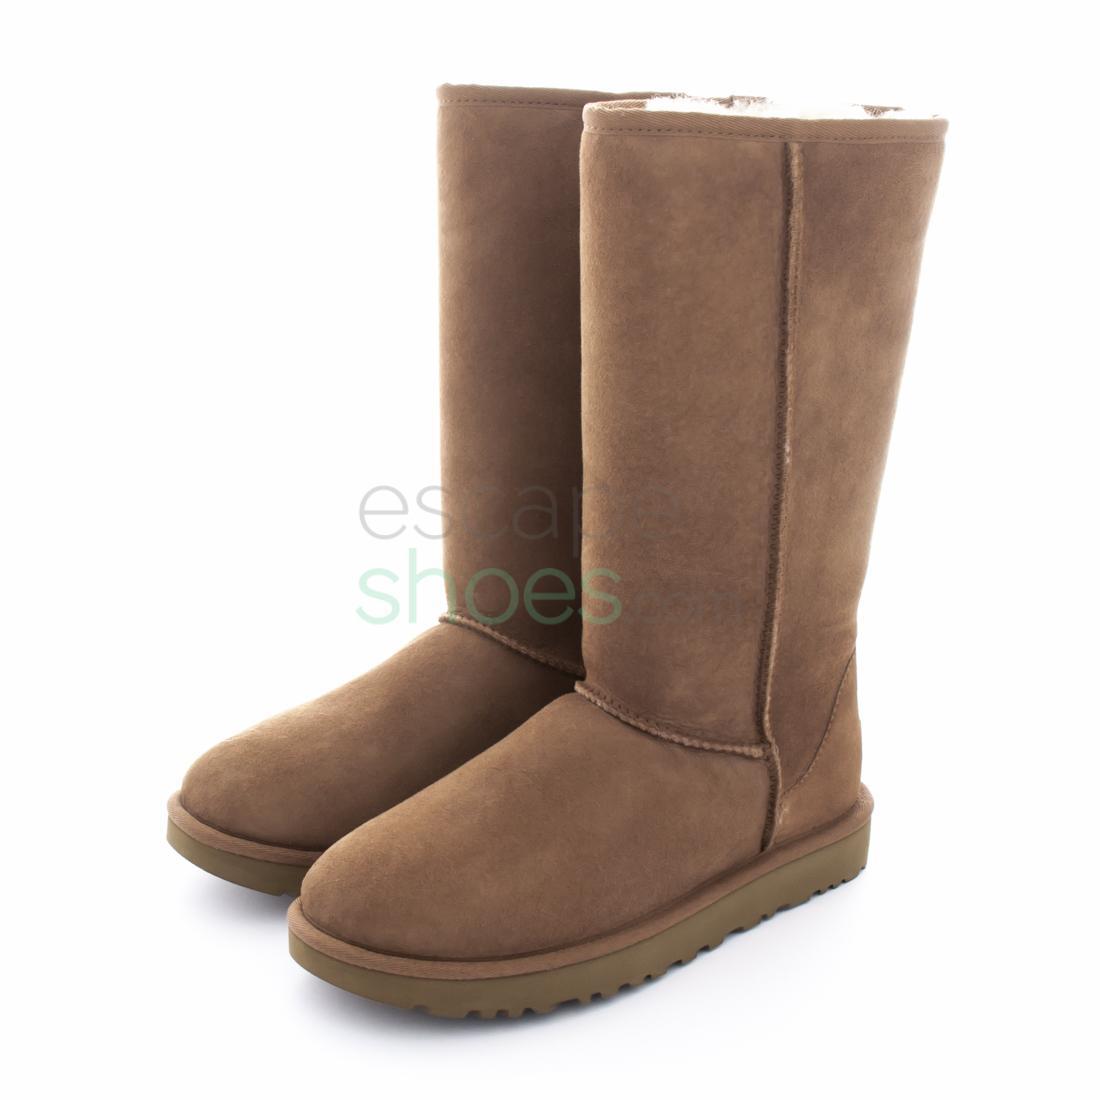 763beabdead Boots UGG Australia Classic Tall II Chestnut 1016224